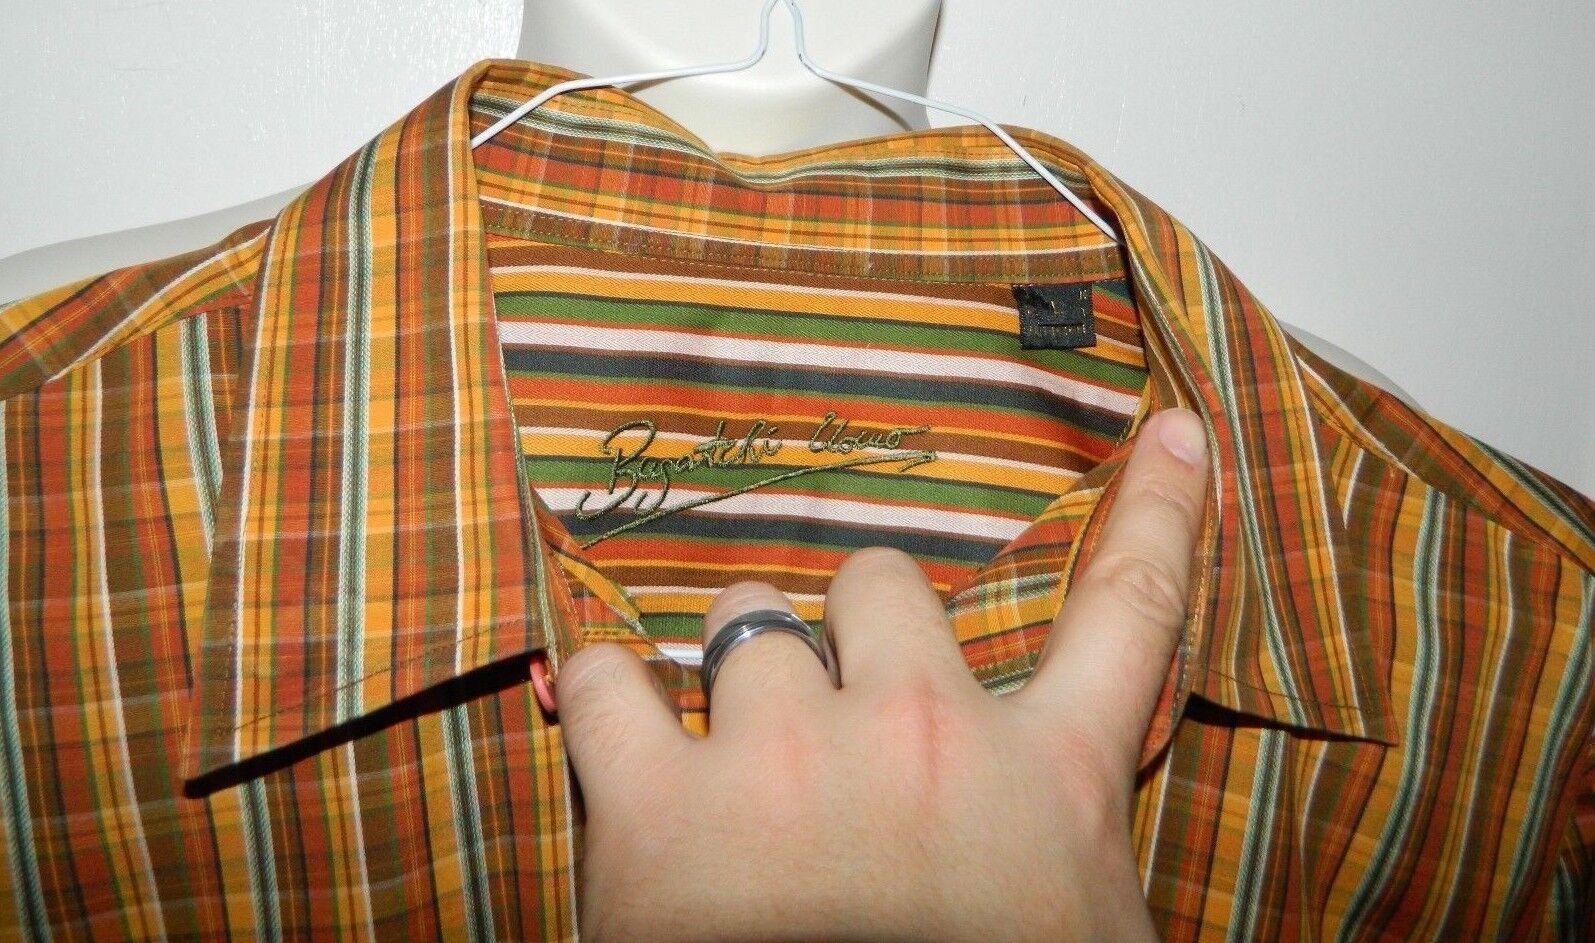 Bugatchi Uomo Long Sleeve marrone arancia Plaid Pattern Shirt Uomo's Uomo's Shirt Size Medium M 3a7fb9